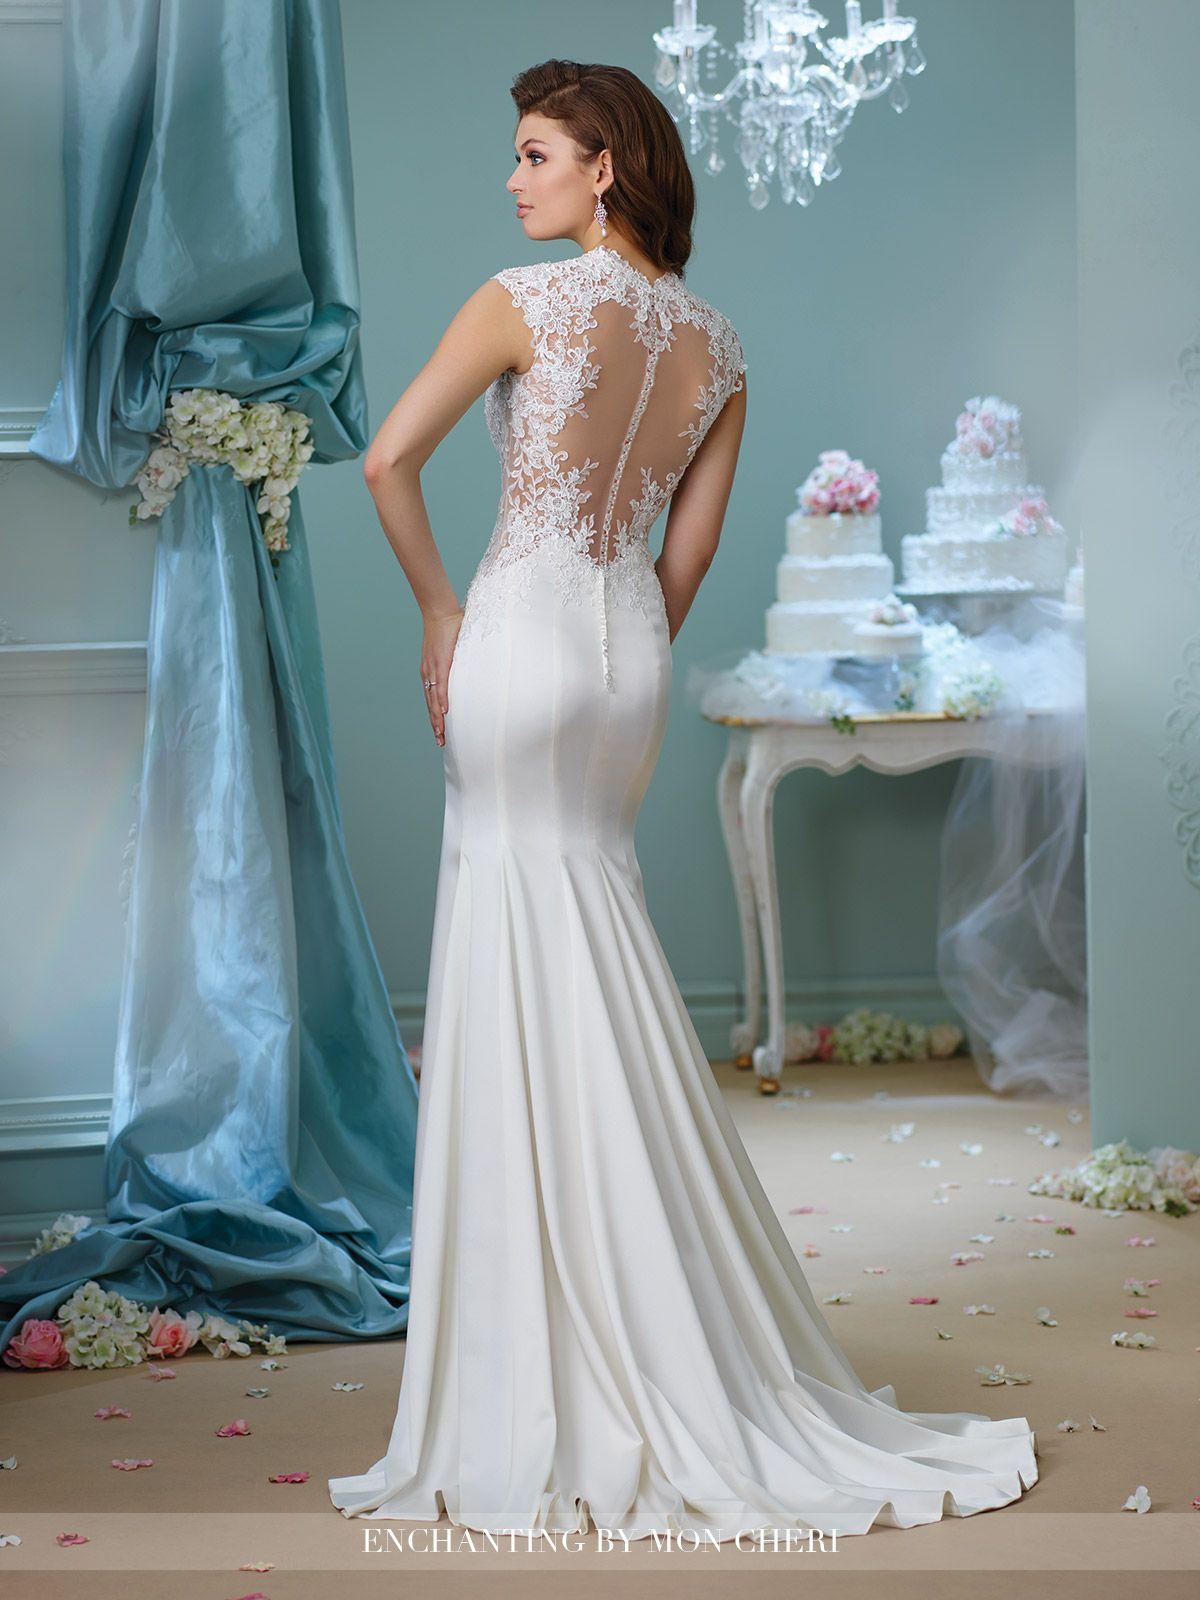 Venise Lace Trumpet Wedding Dress | Trumpets, Informal wedding ...